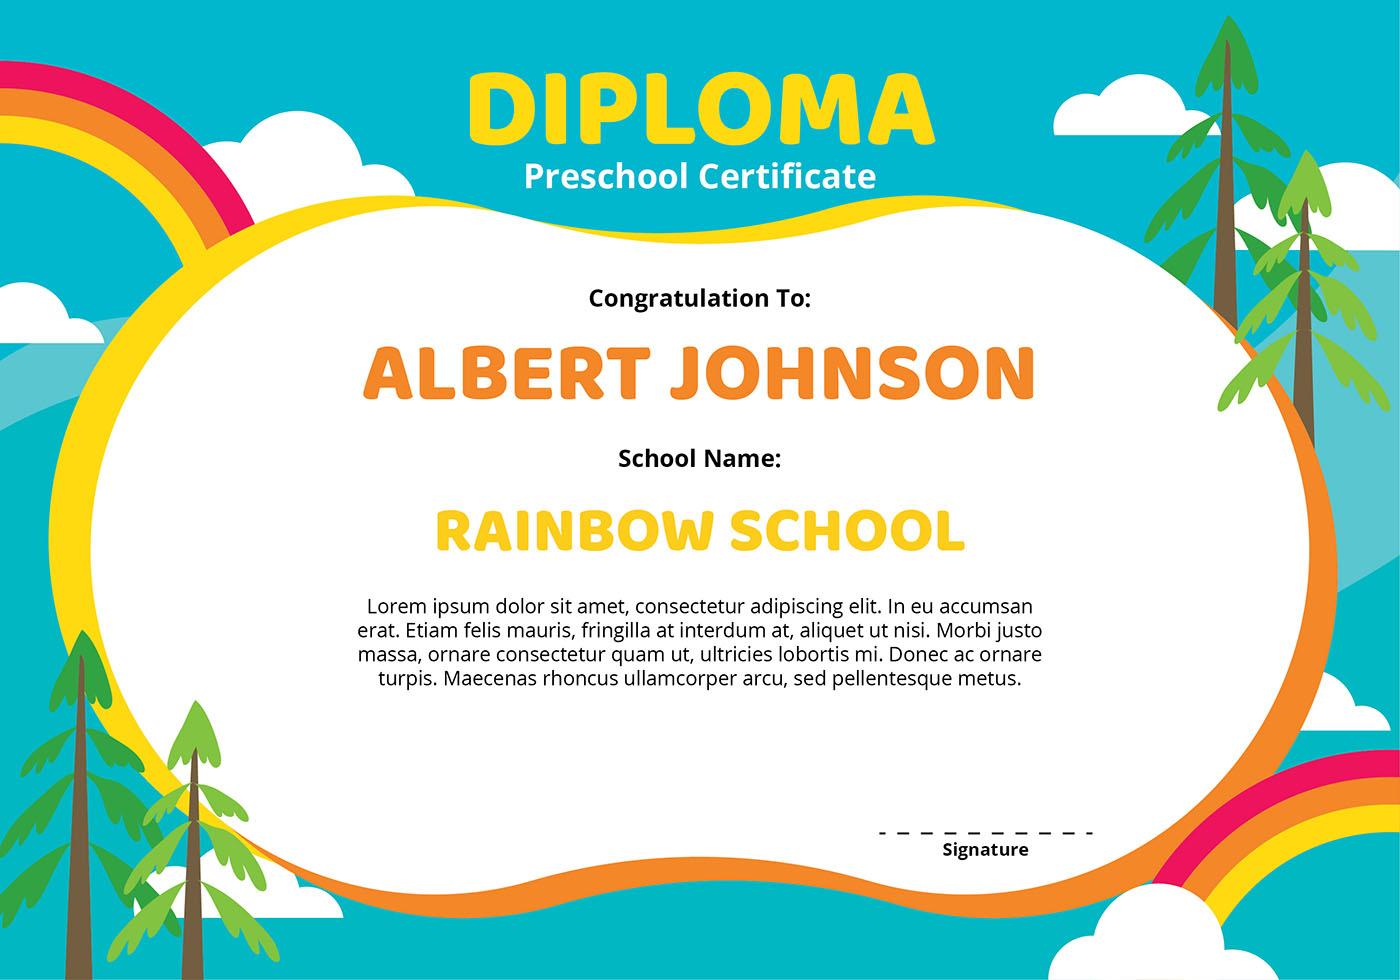 Diploma Preschool Certificate Template Download Free Vector Art